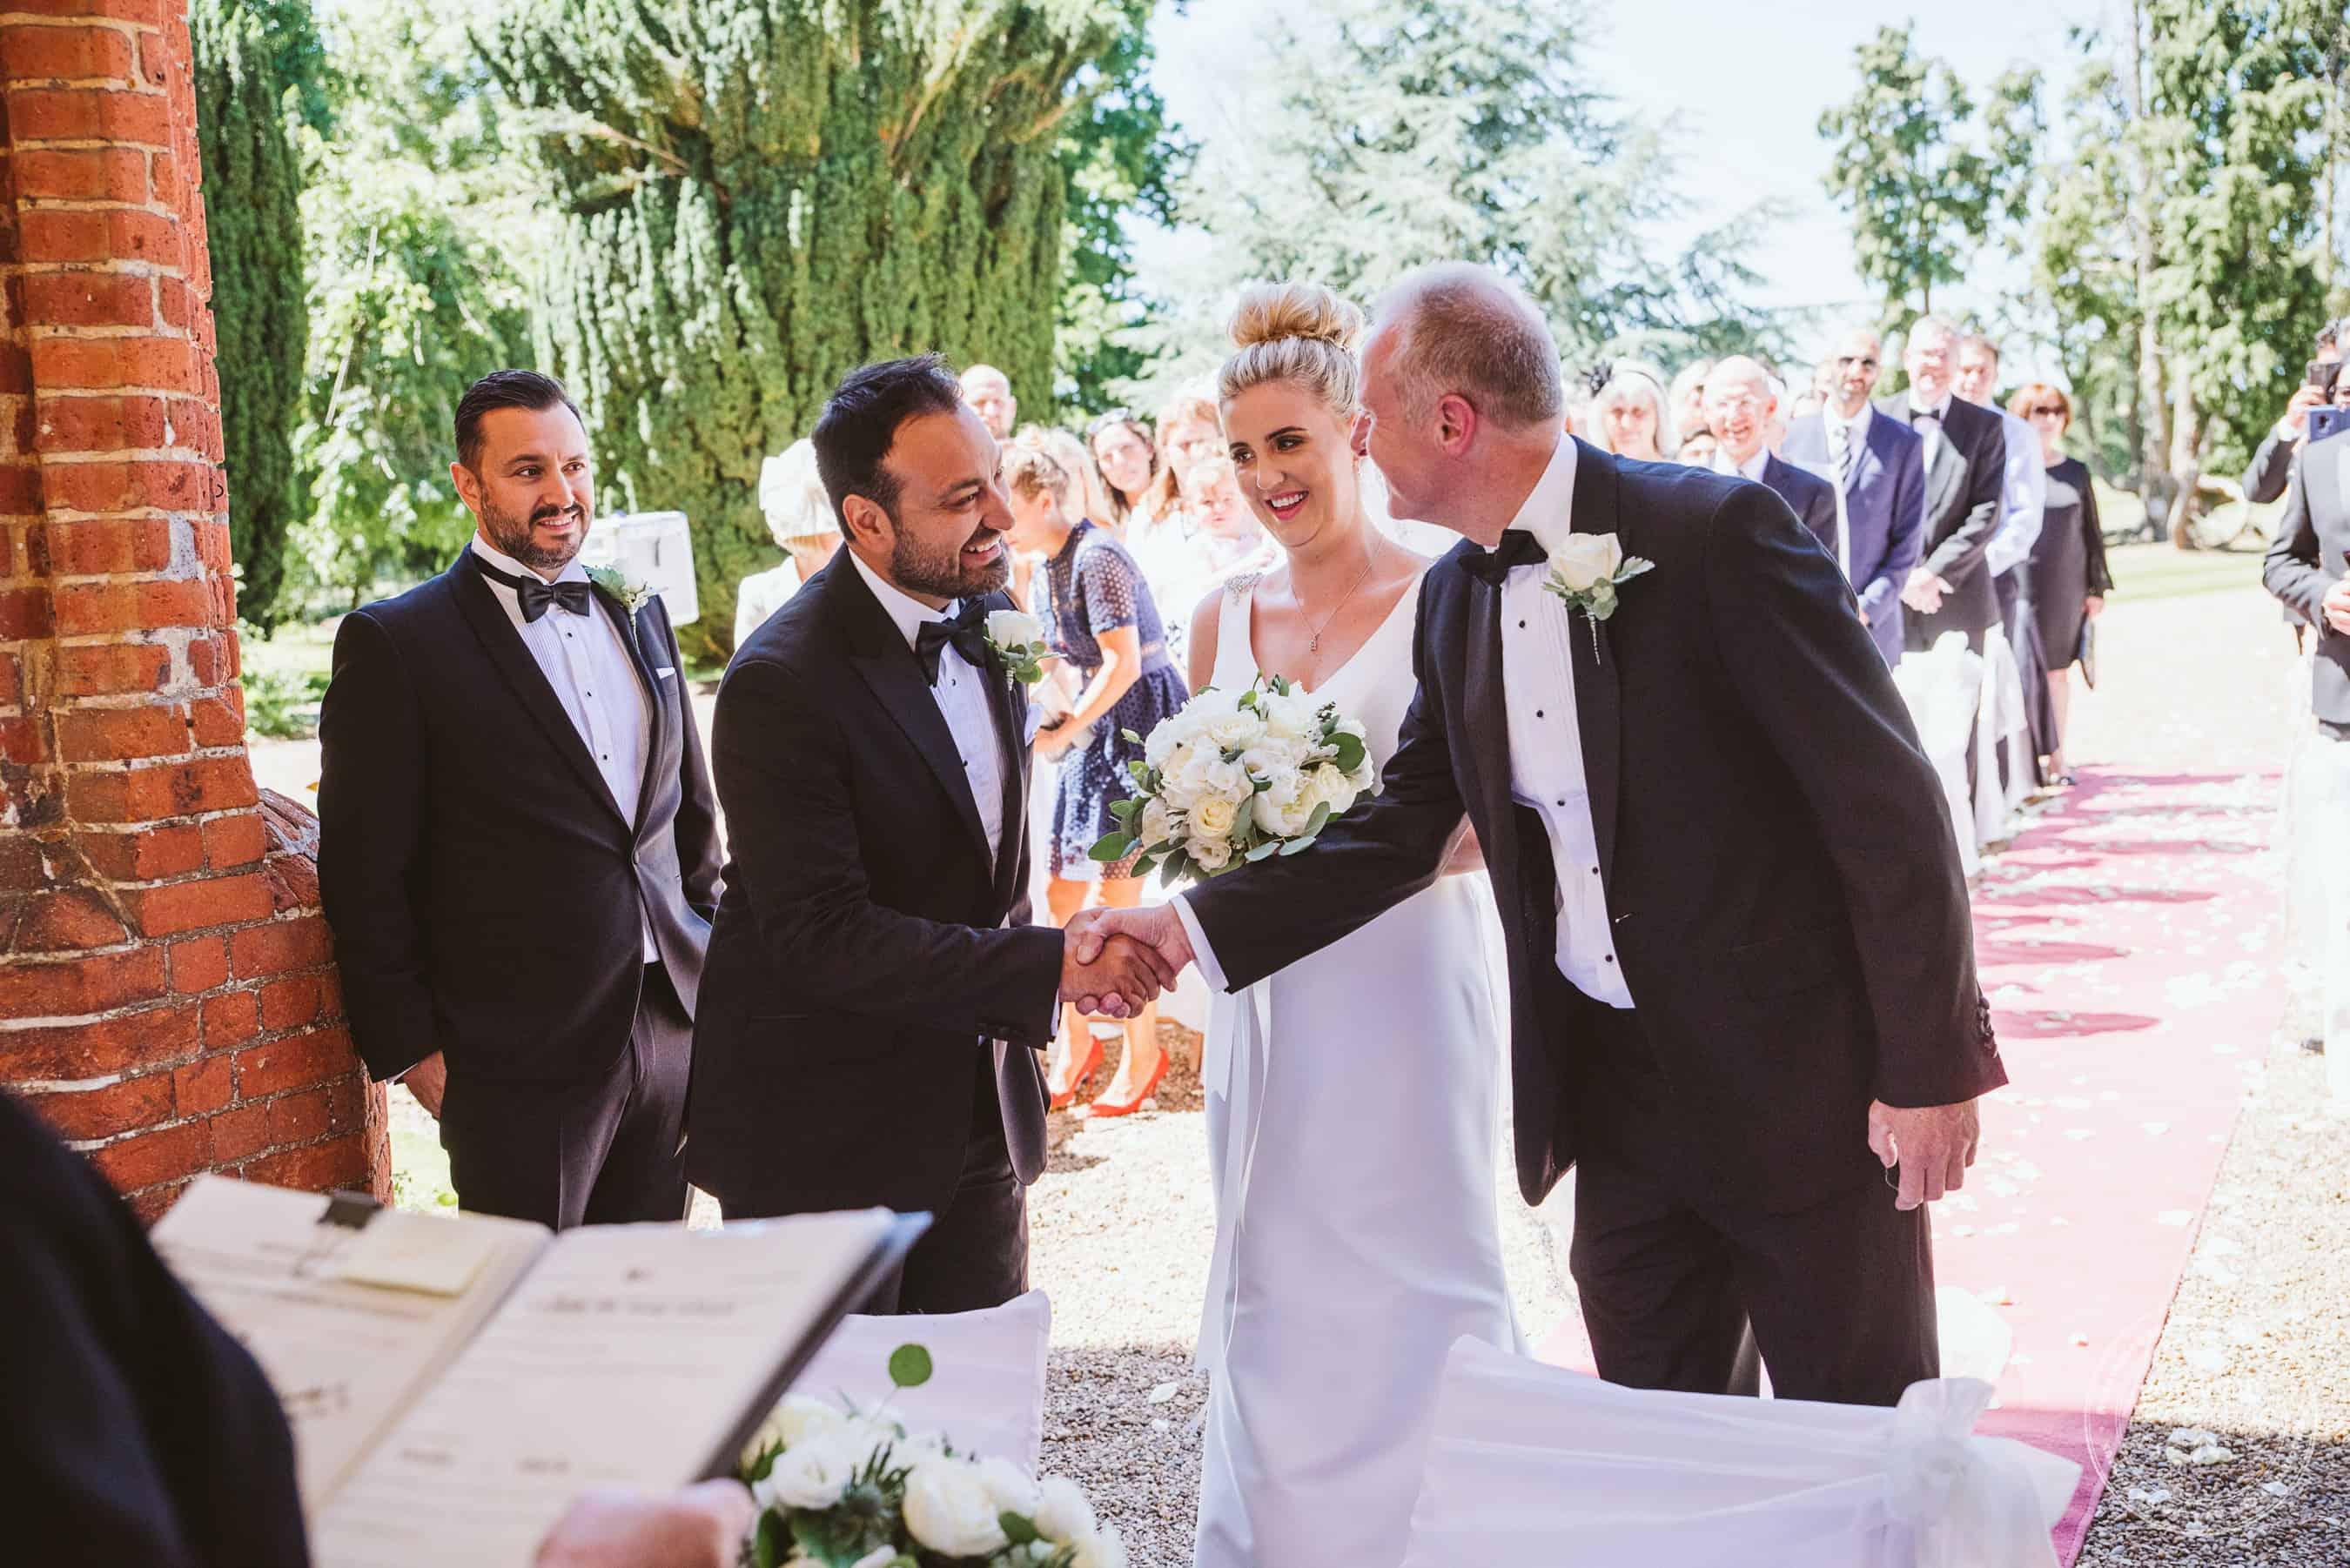 220618 Gosfield Hall Wedding Photography Lavenham Photographic 0074